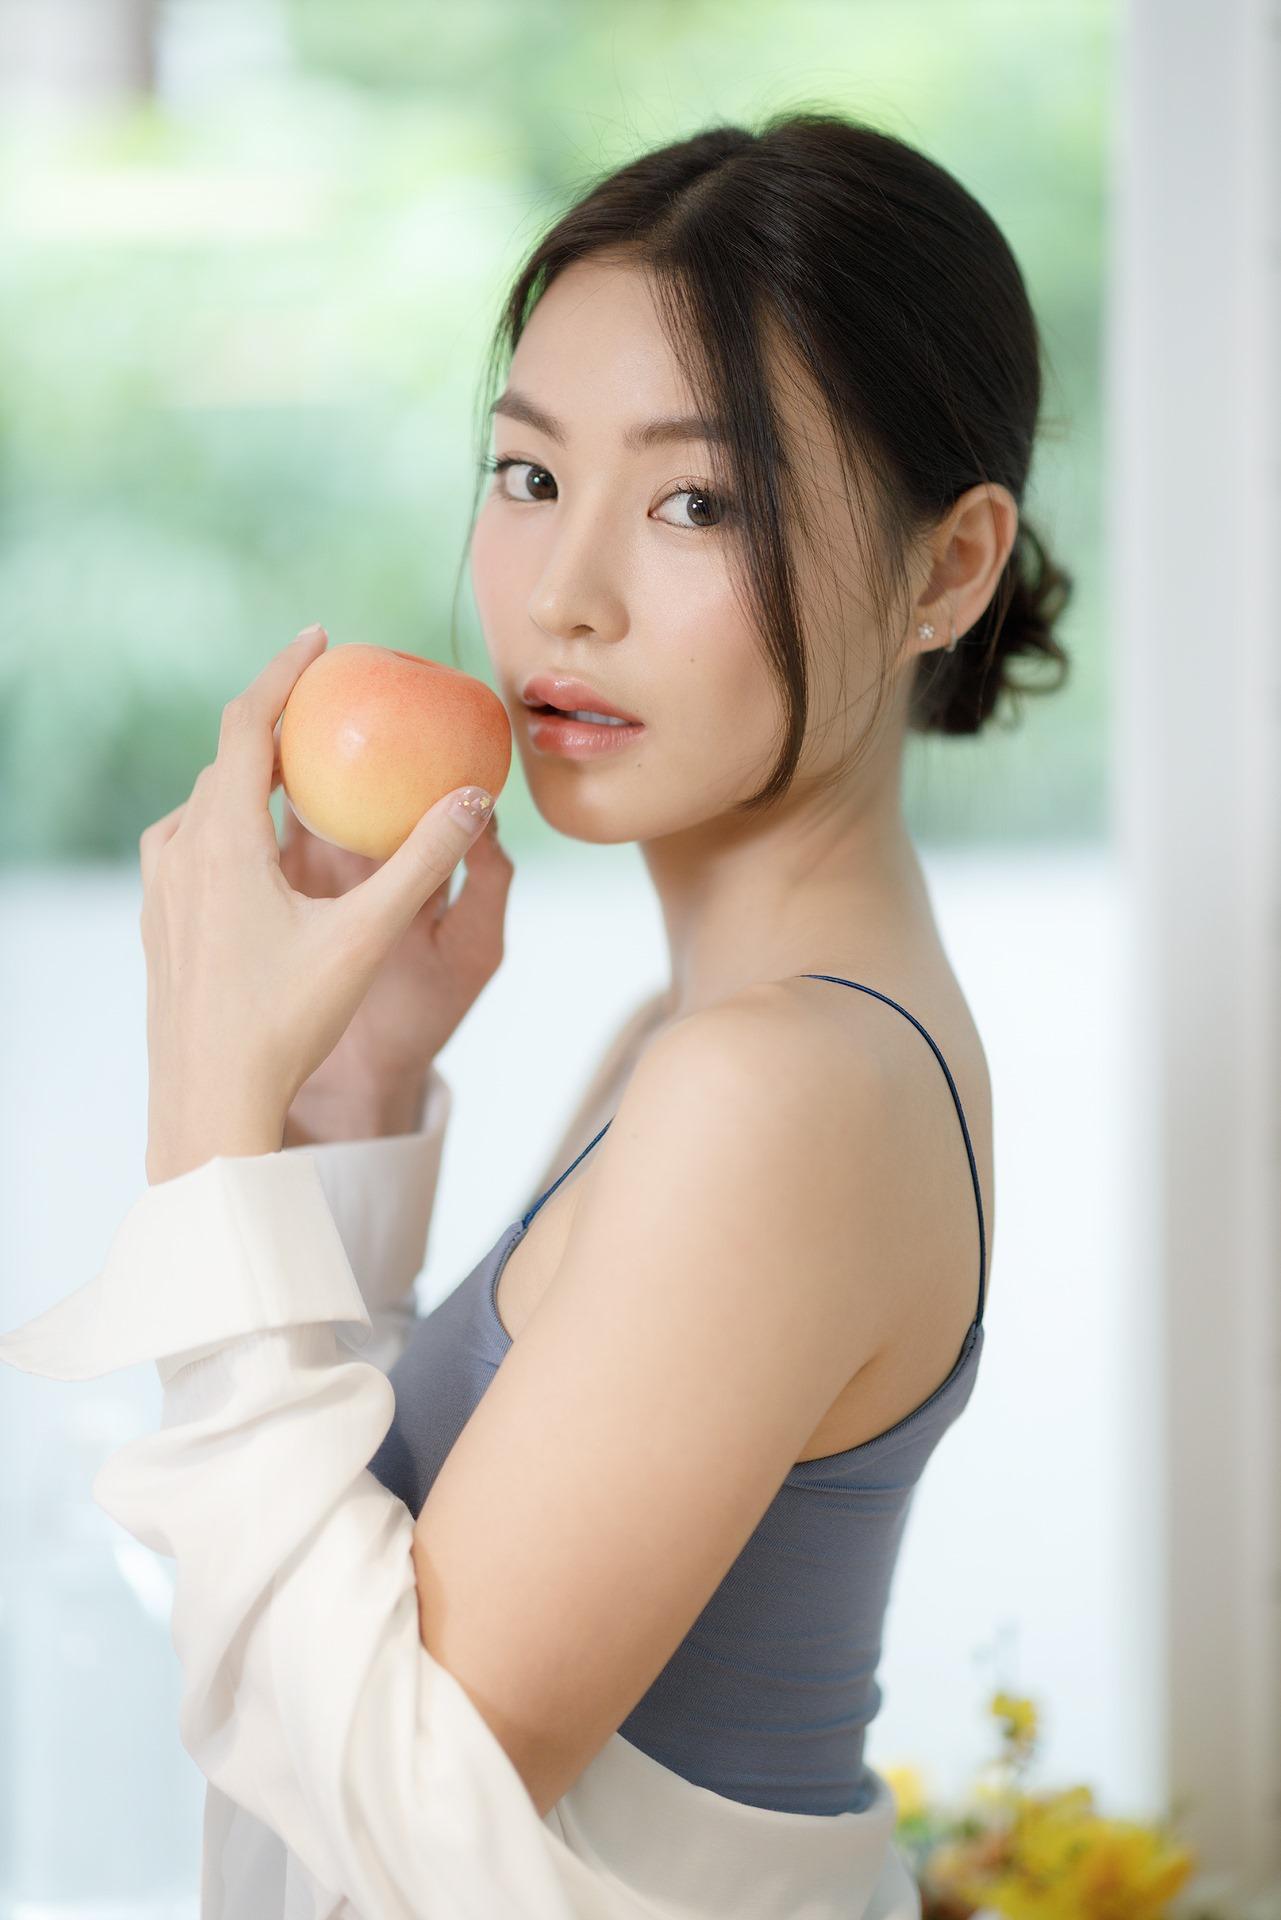 Fruity - Kapook Phatchara